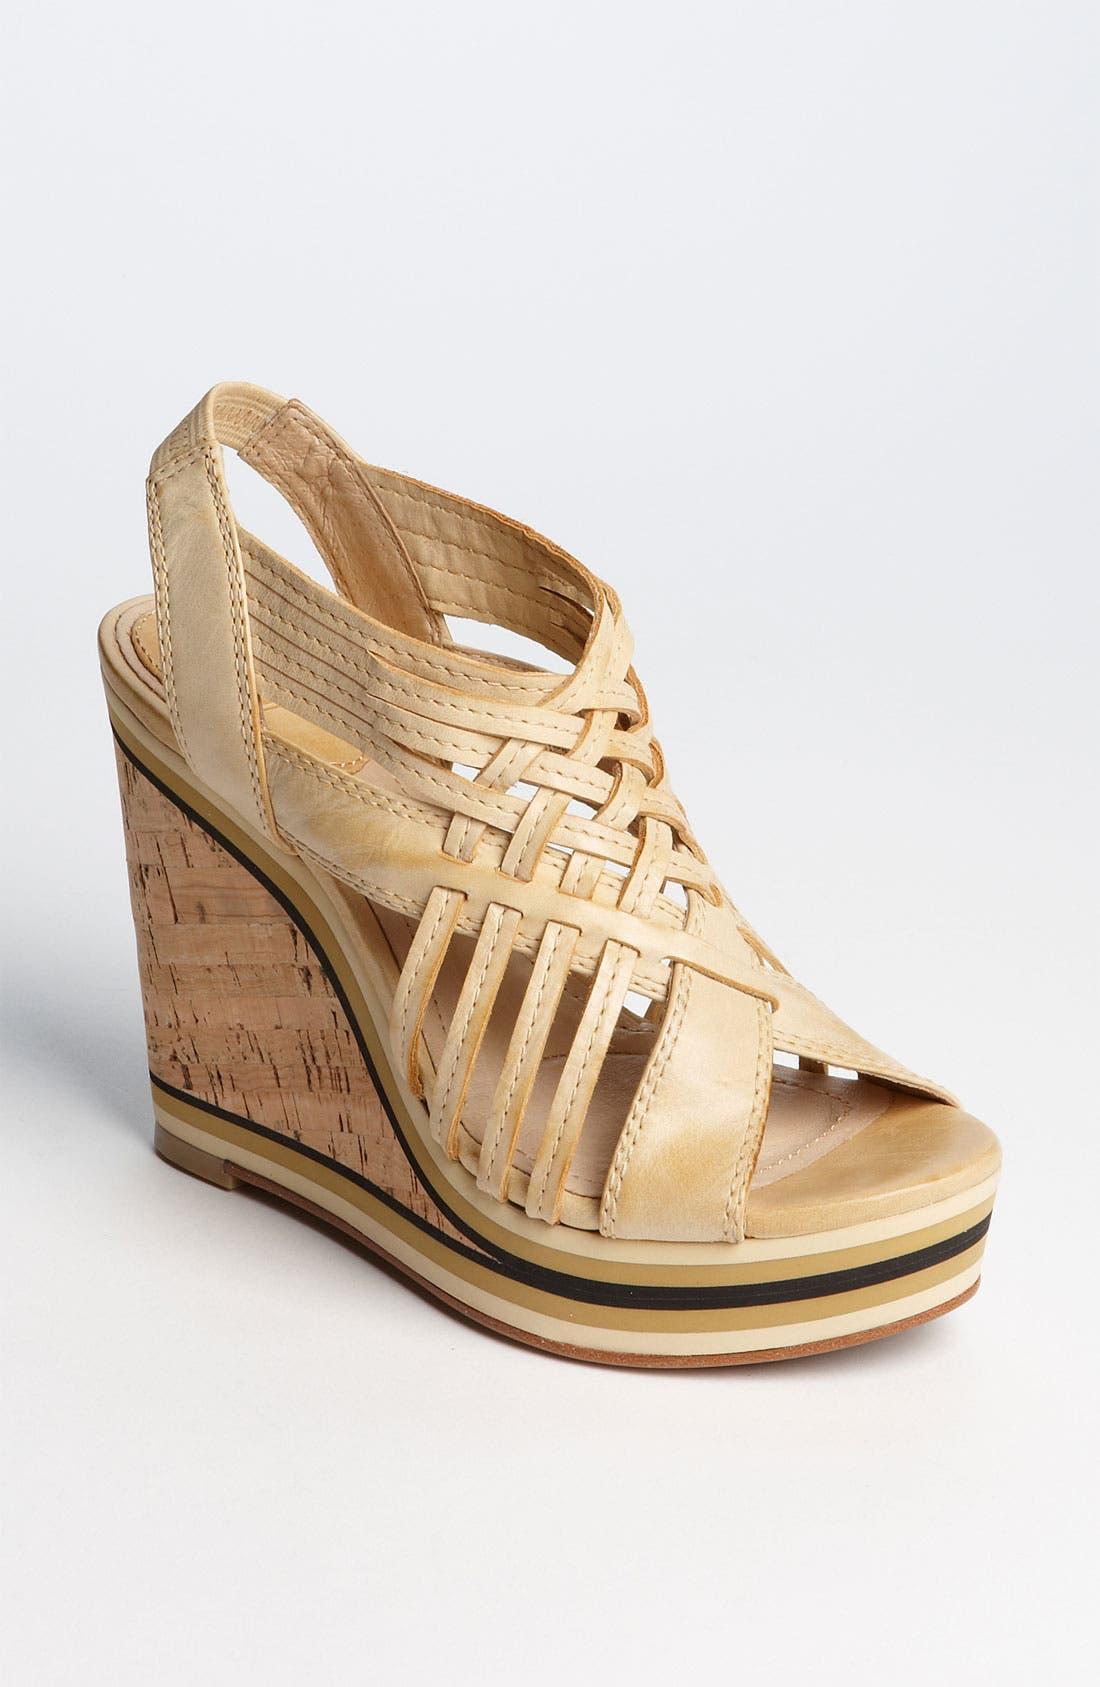 Alternate Image 1 Selected - Frye 'Corrina' Woven Sandal